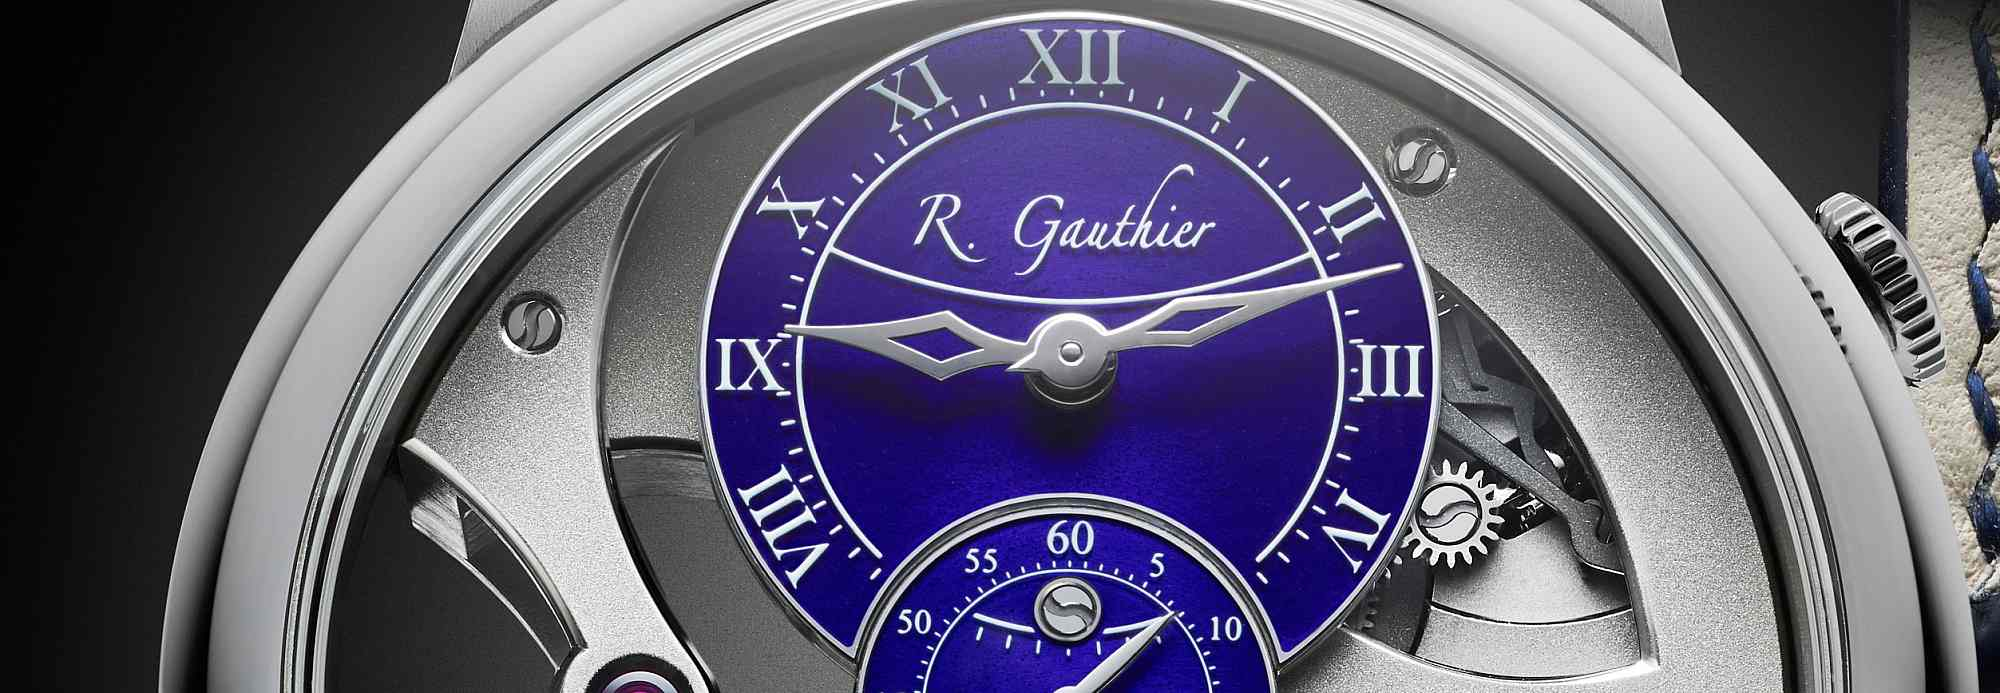 Romain_Gauthier_Insight_Micro-Rotor_platinum_6_blue_enamel_dial_2